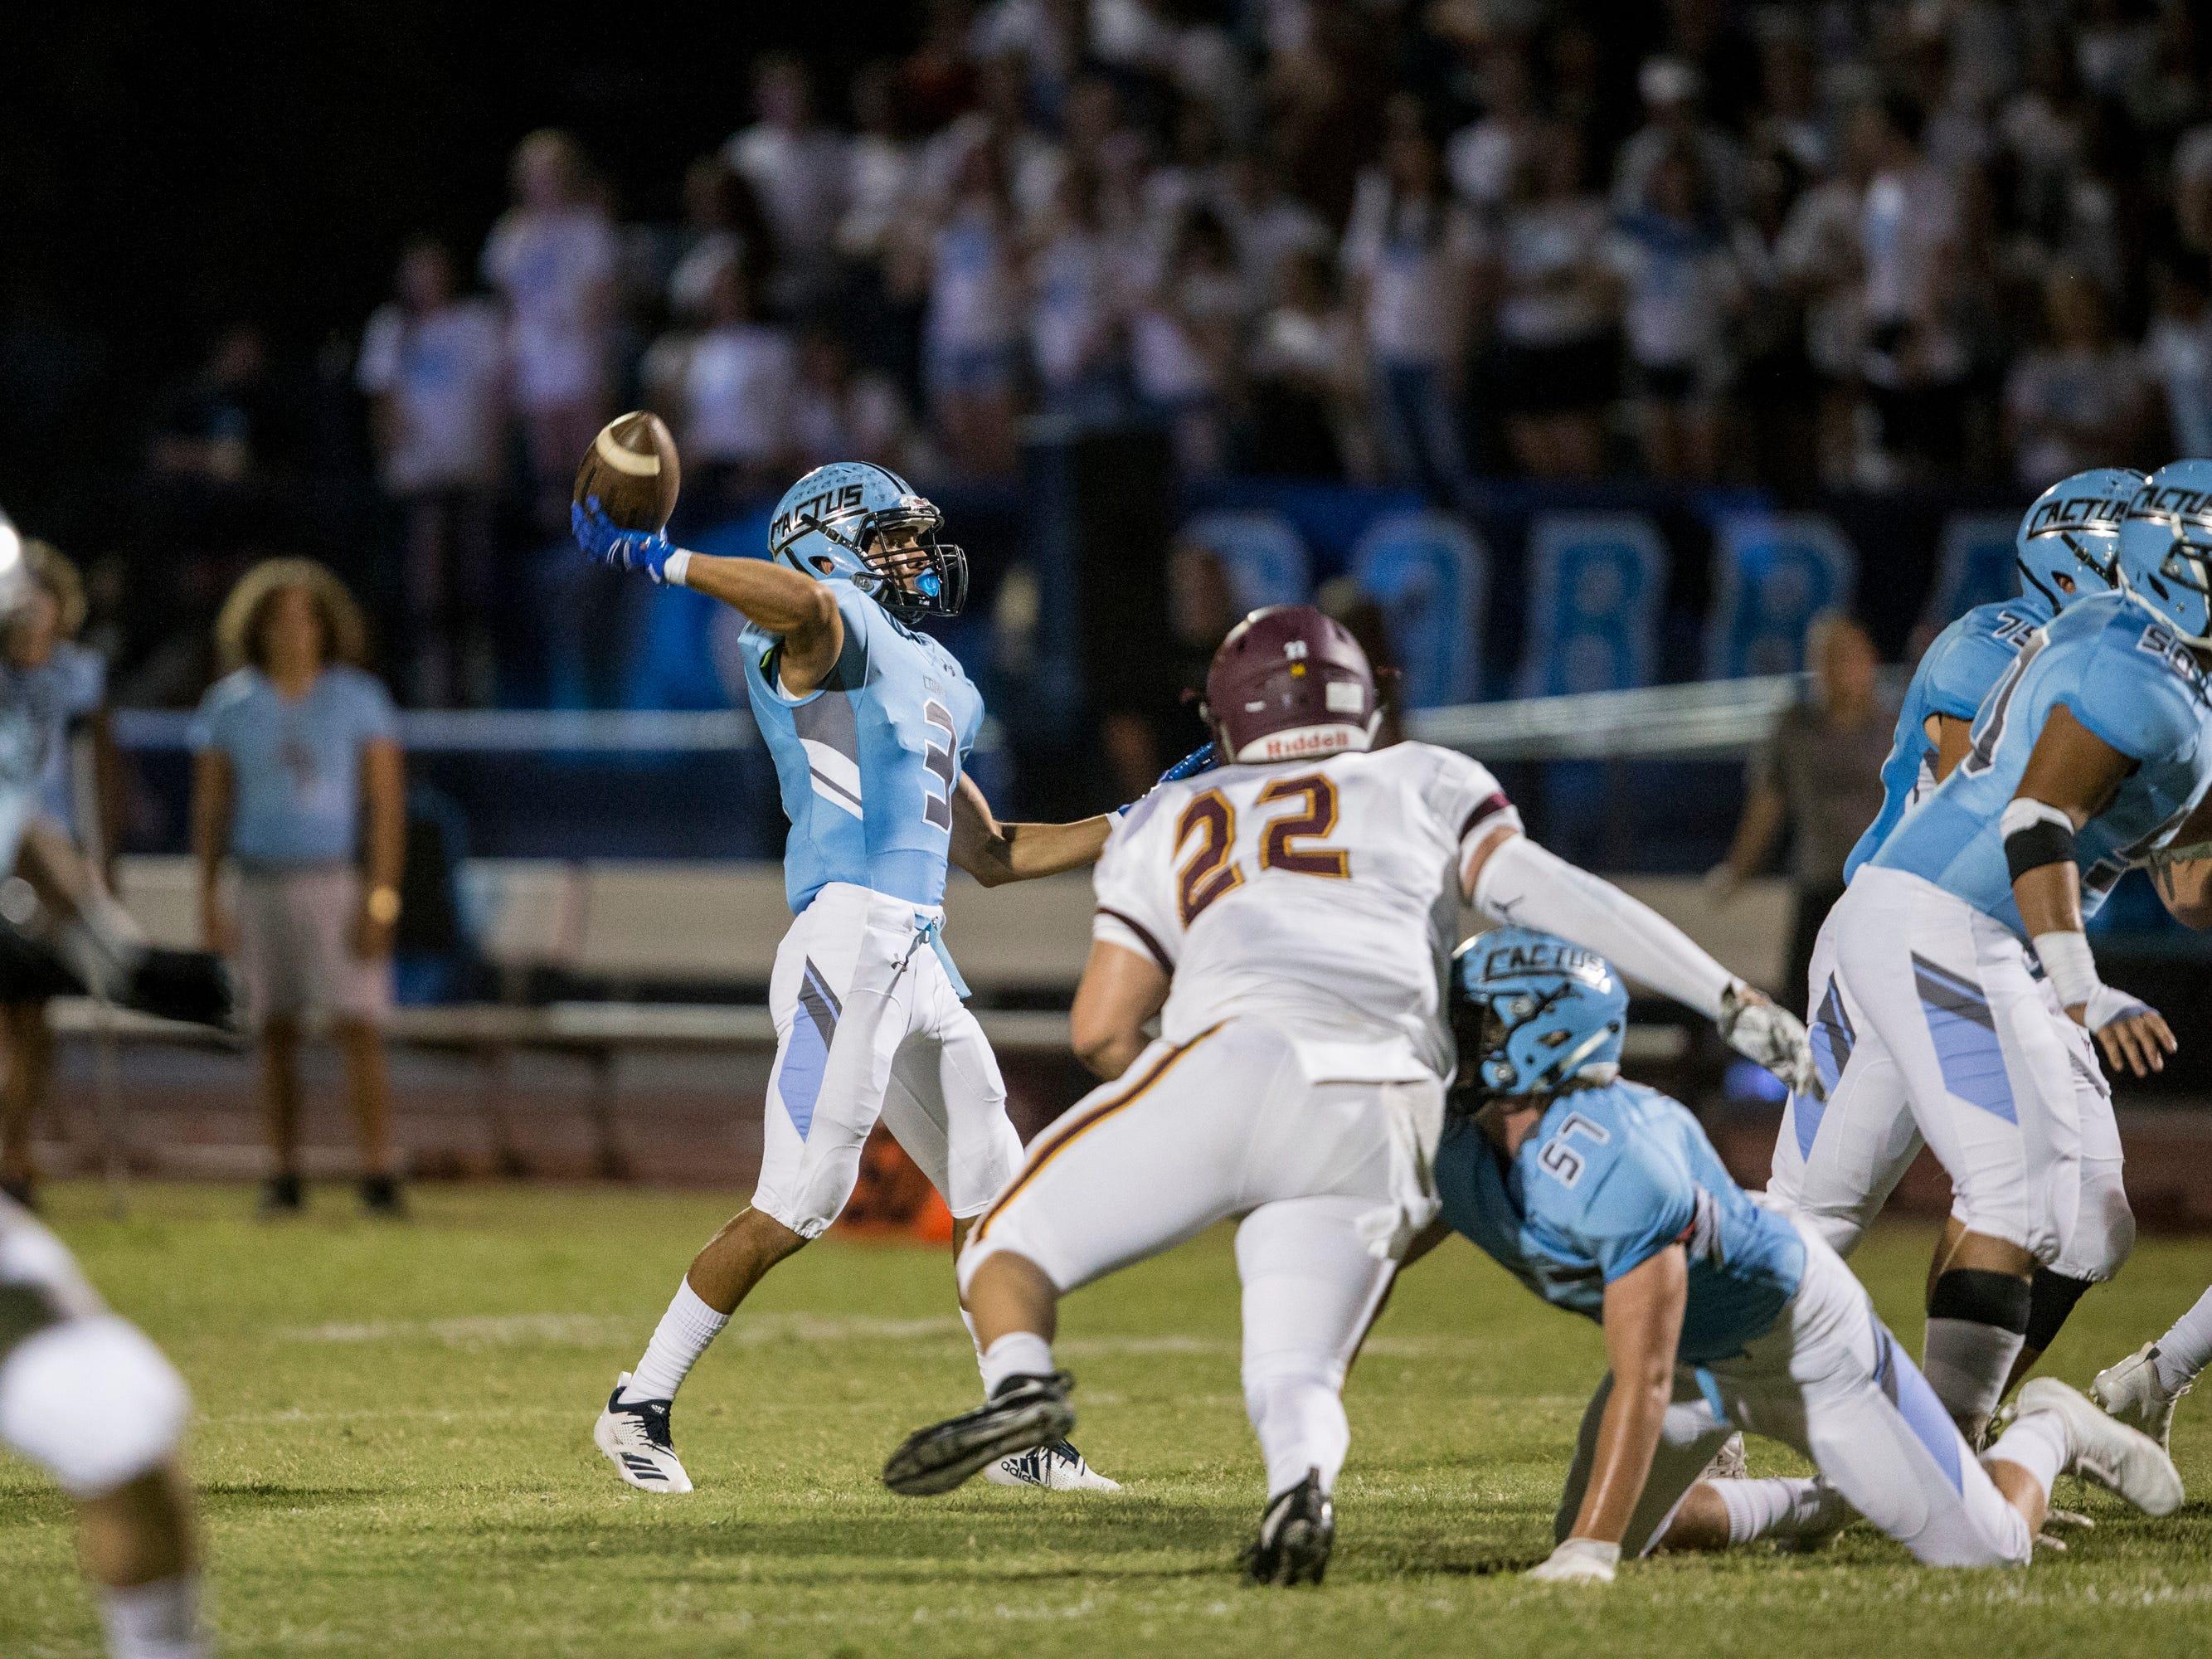 Cactus' Garrett Monroe throws for a touchdown against Salpointe in the 1st quarter on Friday, Sept. 14, 2018, at Cactus High School in Glendale, Ariz.#azhsfb